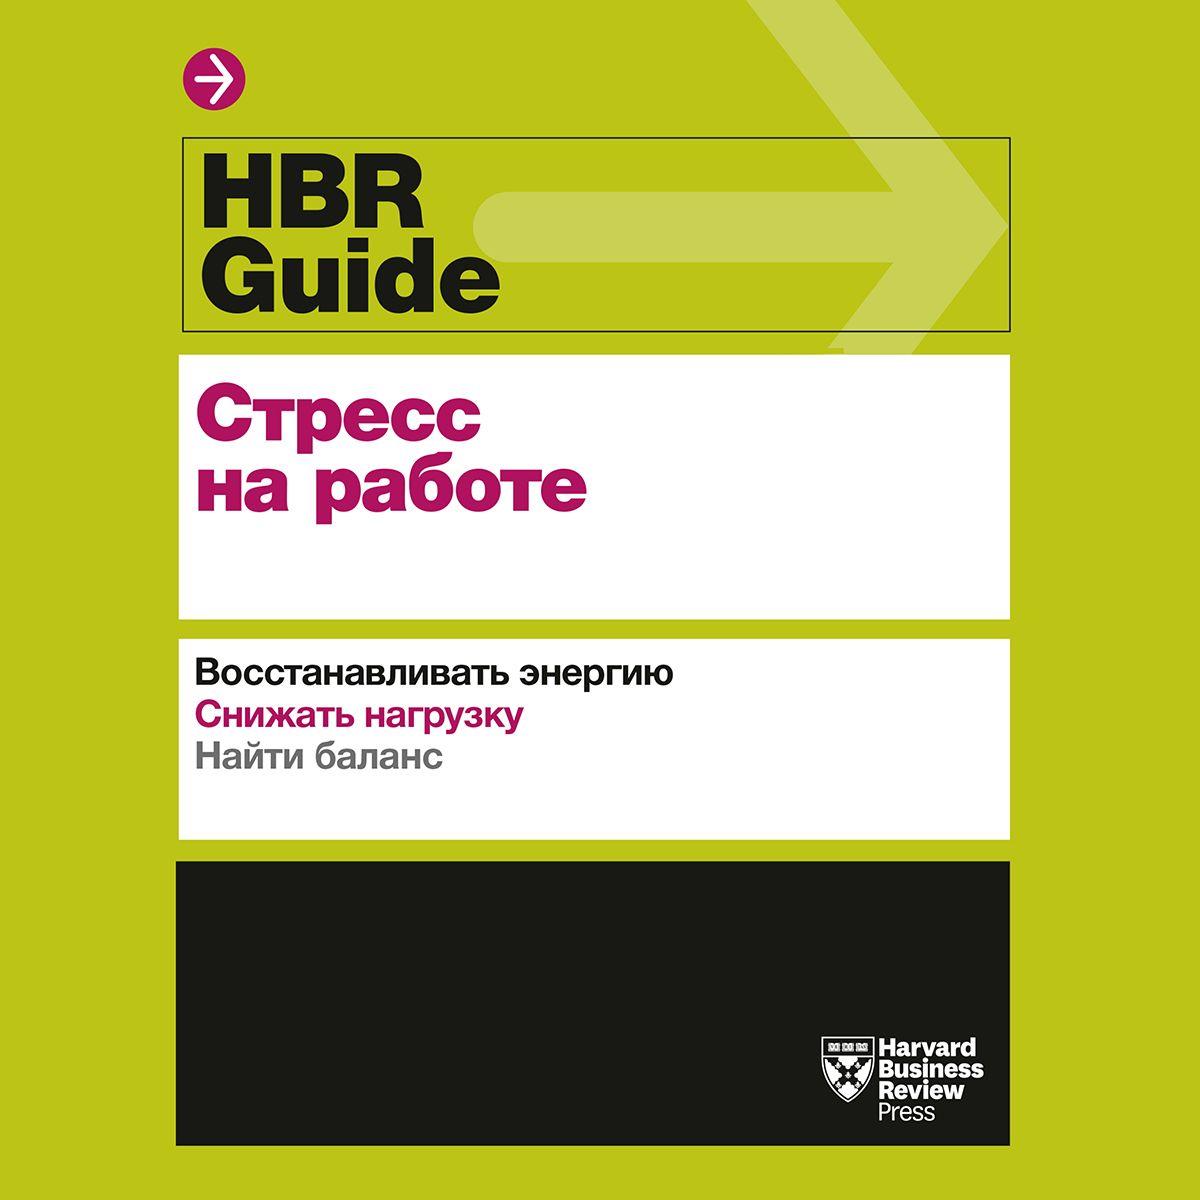 HBR Guide. Стресс на работе